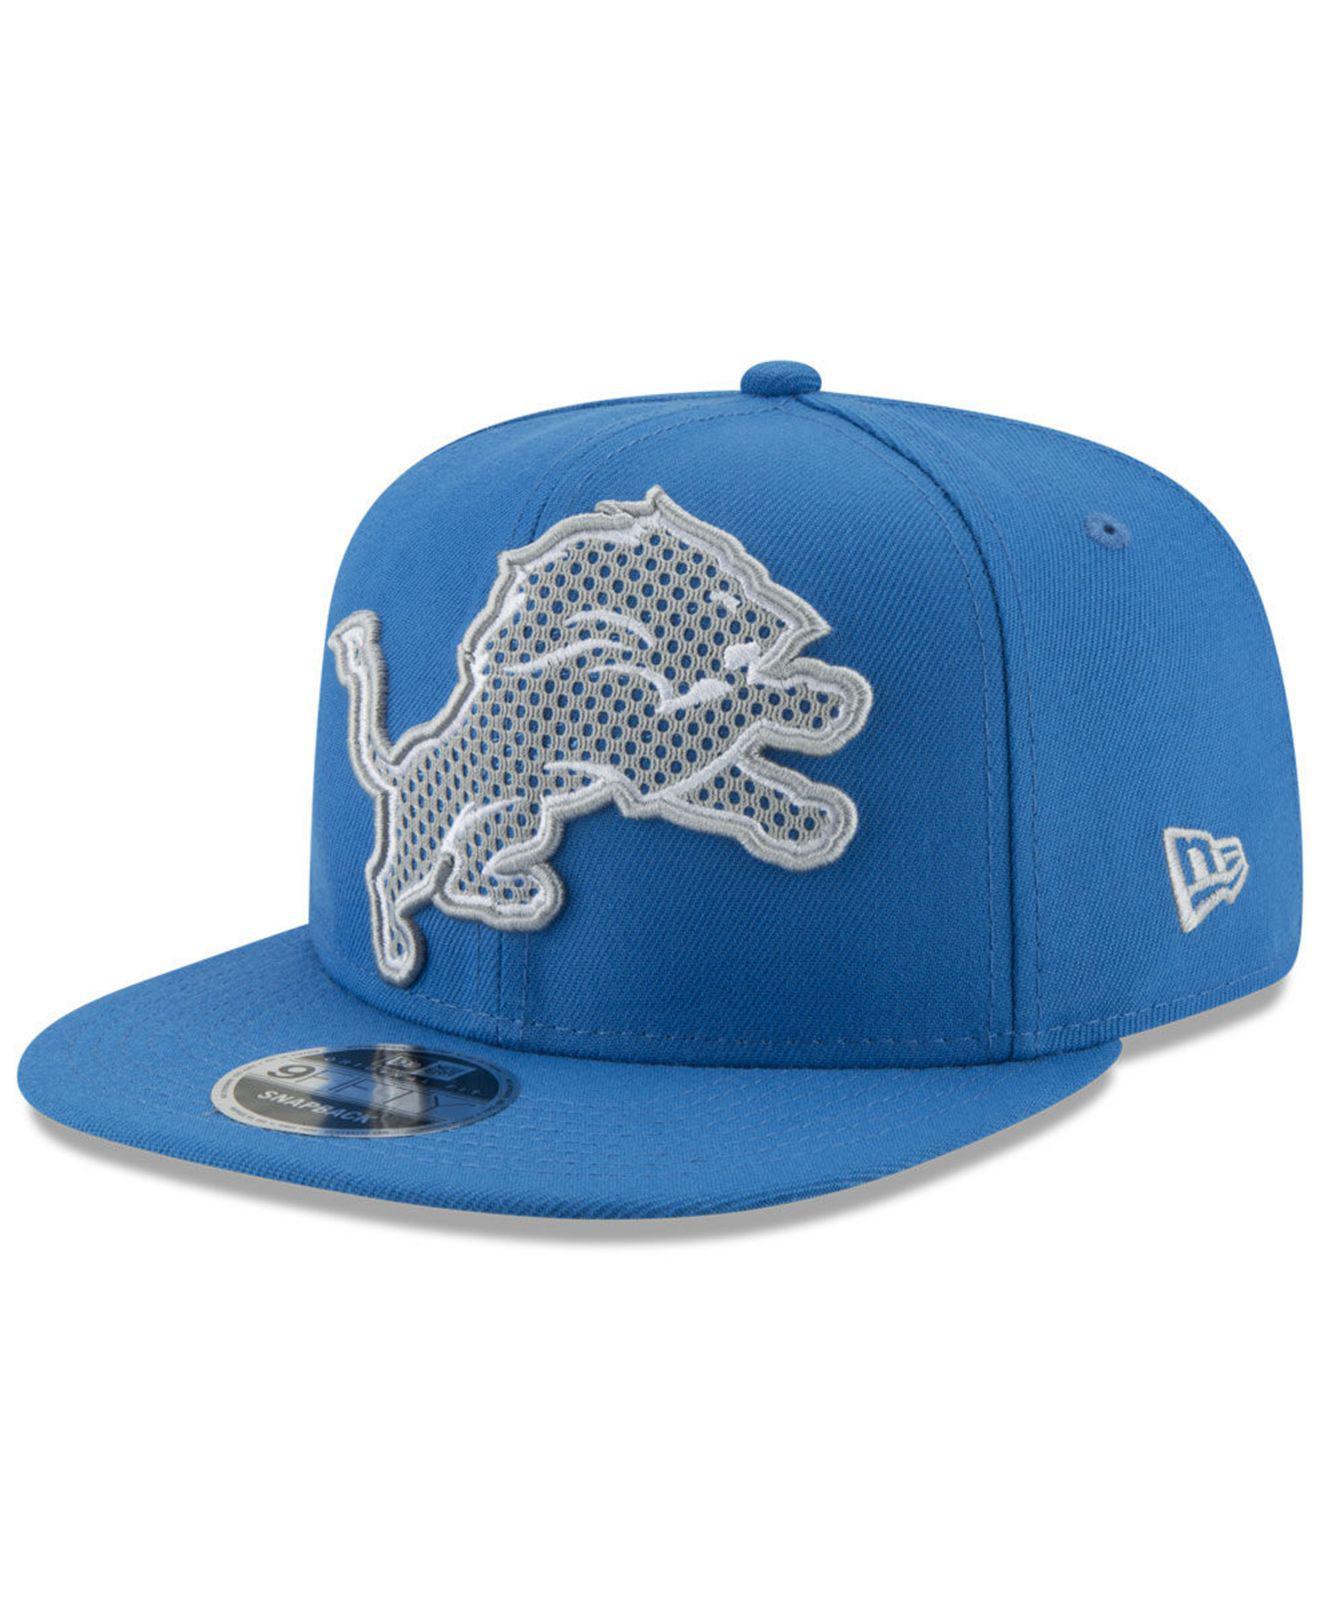 4d0d595e354 Lyst - Ktz Detroit Lions Meshed Mix 9fifty Snapback Cap in Blue for Men